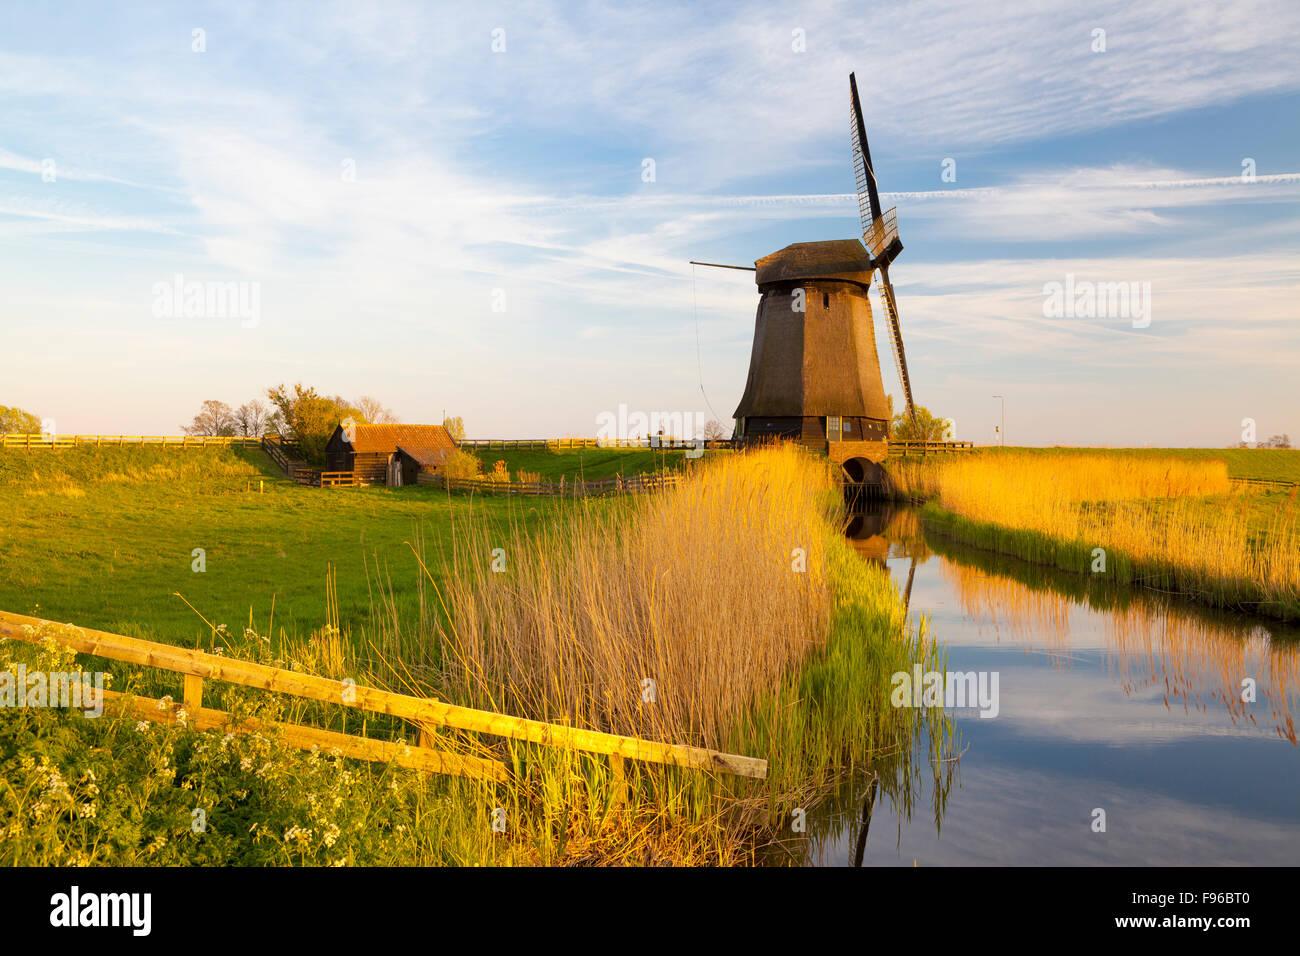 Windmill, Schermerhorn, North Holland, Netherlands - Stock Image